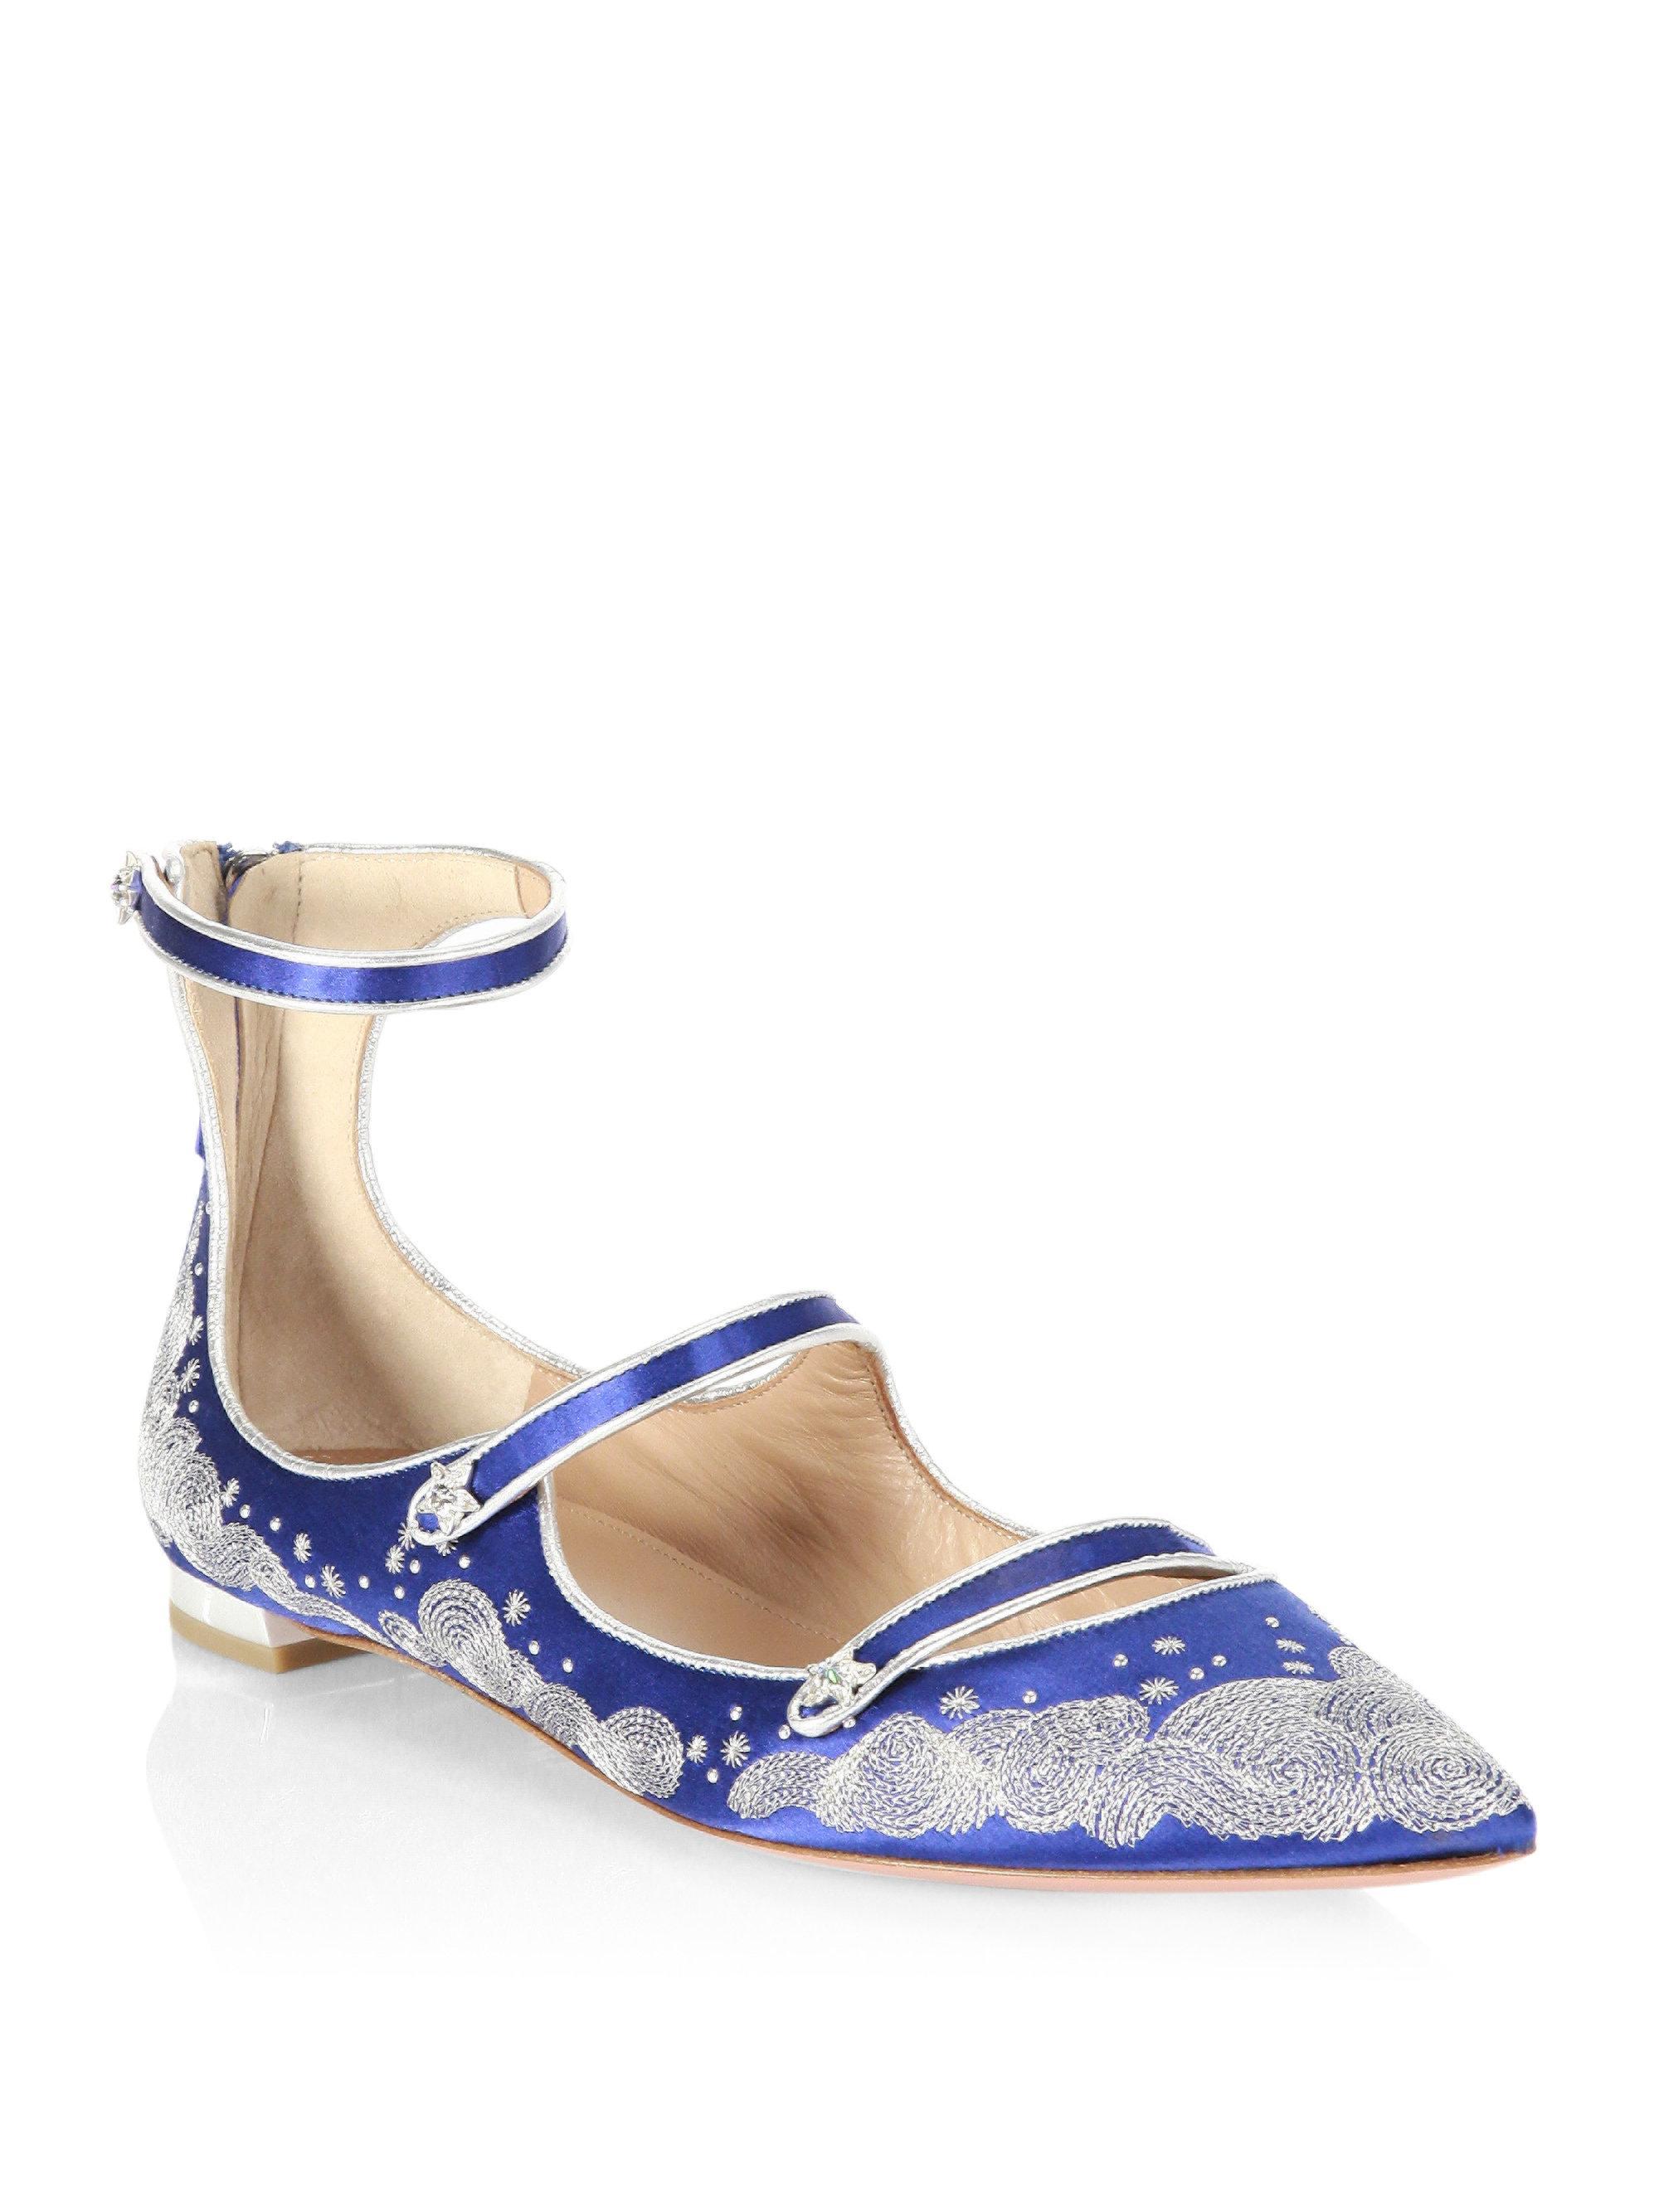 + Claudia Schiffer Cloudy Star Embroidered Satin Point-toe Flats - Blue Aquazzura 0rUQ4i4Q